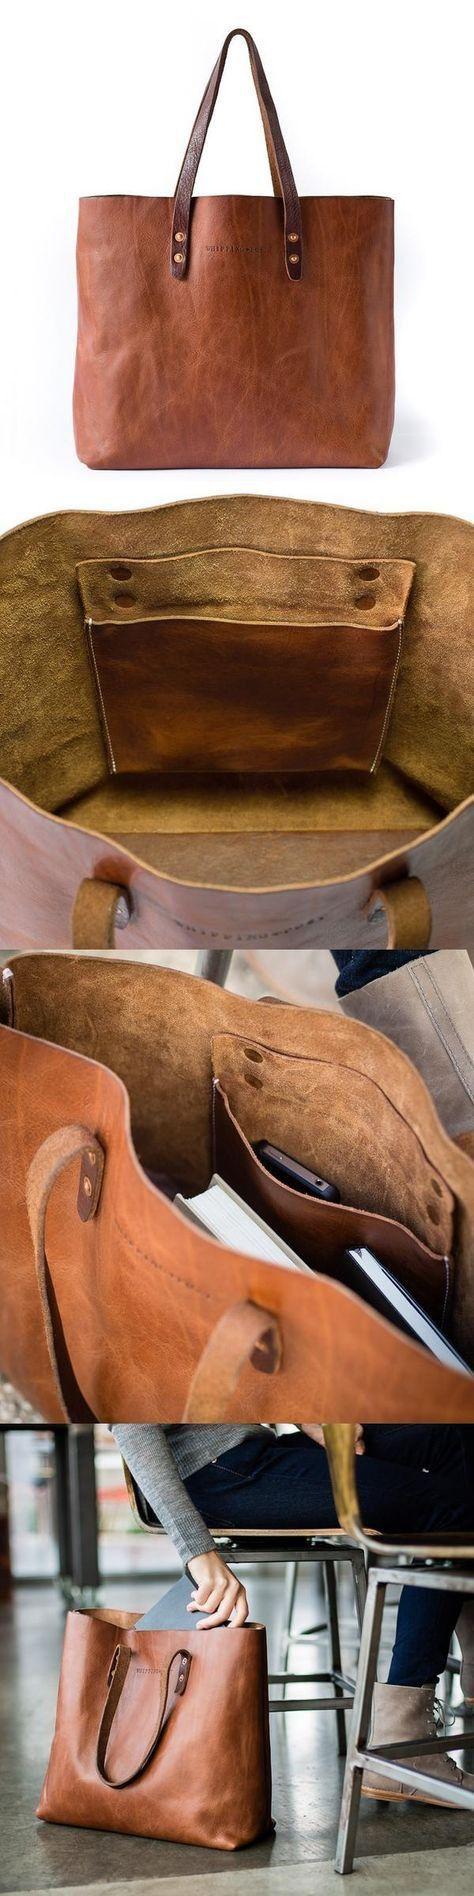 Шьем женскую кожаную сумку - Ярмарка Мастеров - ручная работа, handmade